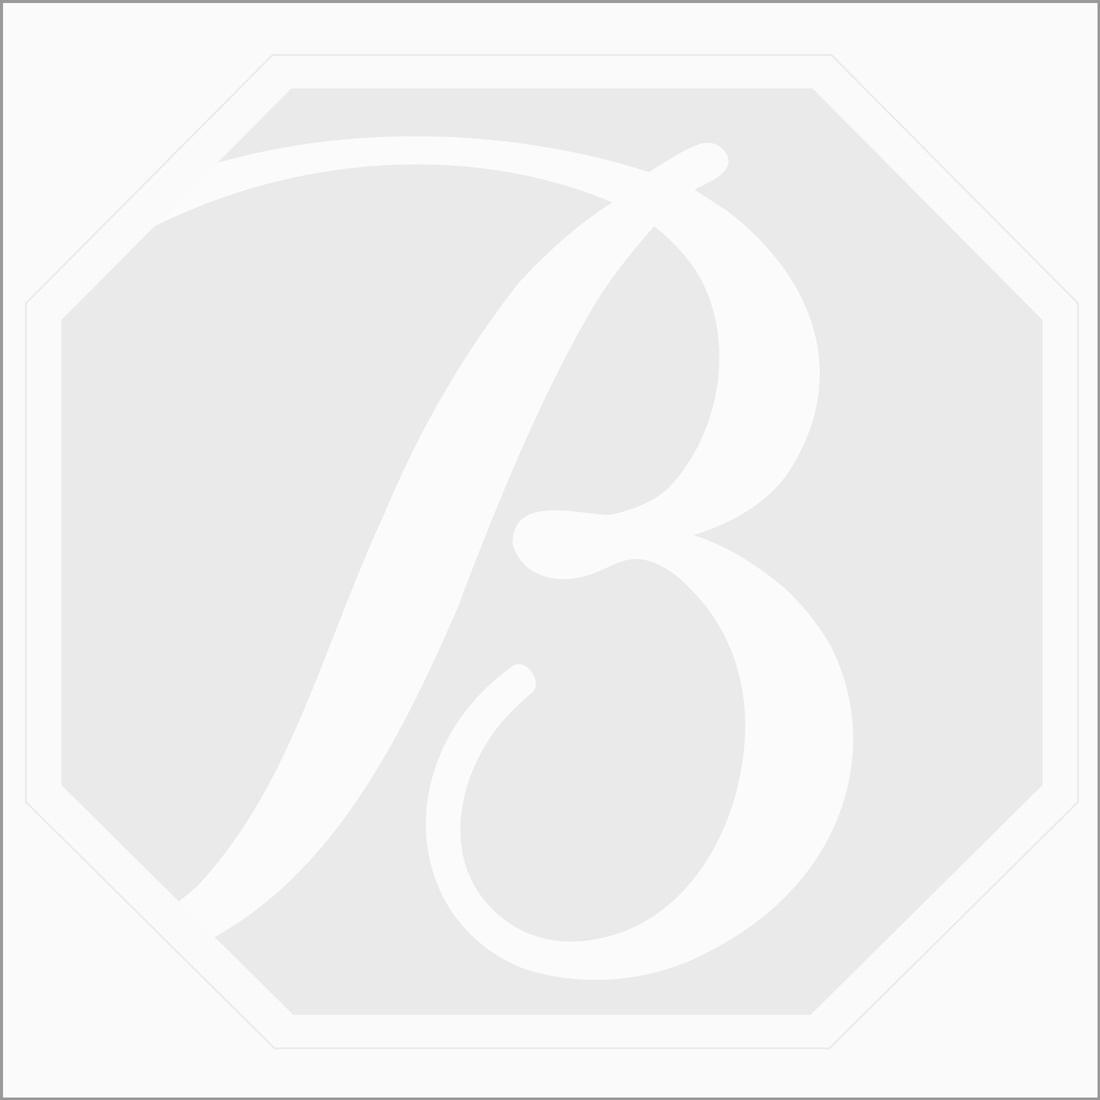 9.80 x 6.50 x 3.90 mm - Dark Gray Pear Shaped Rose Cut Diamond  - 5.00 carats (FncyDiaRC1138)